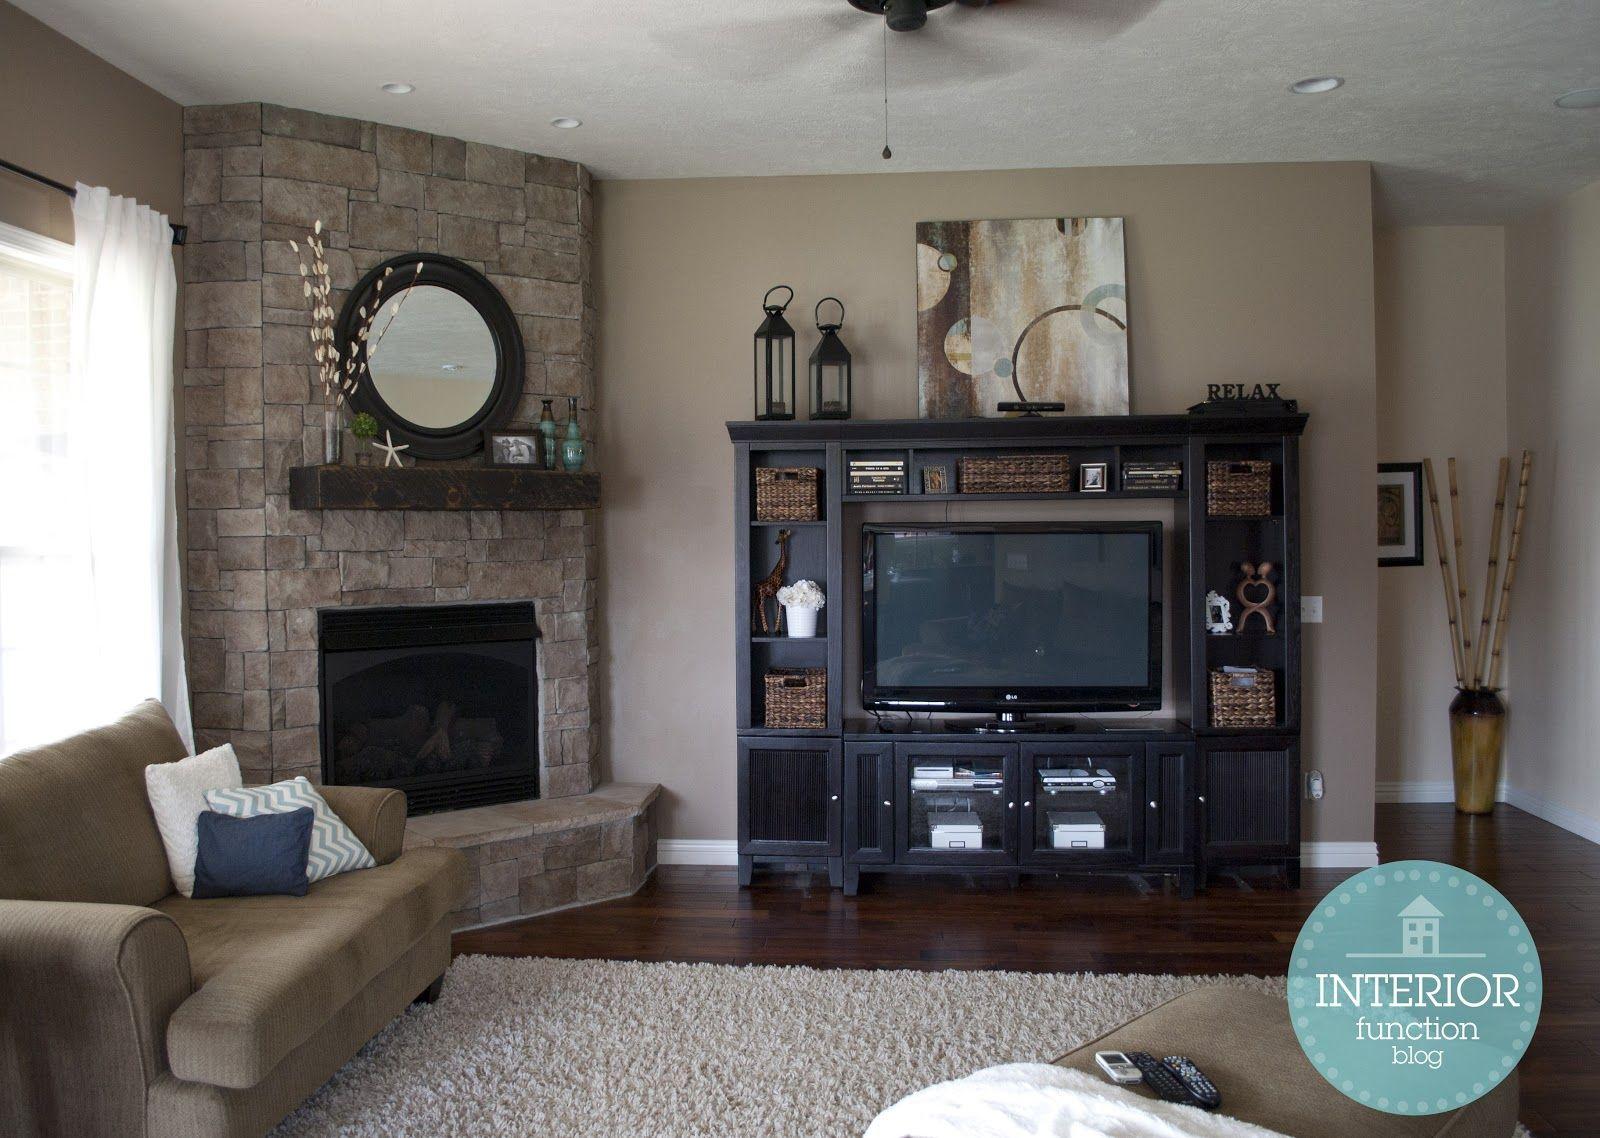 0912 Livingroom Jpg 1 600 1 138 Pixels Fireplaces Layout Corner Fireplace Livingroom Layout